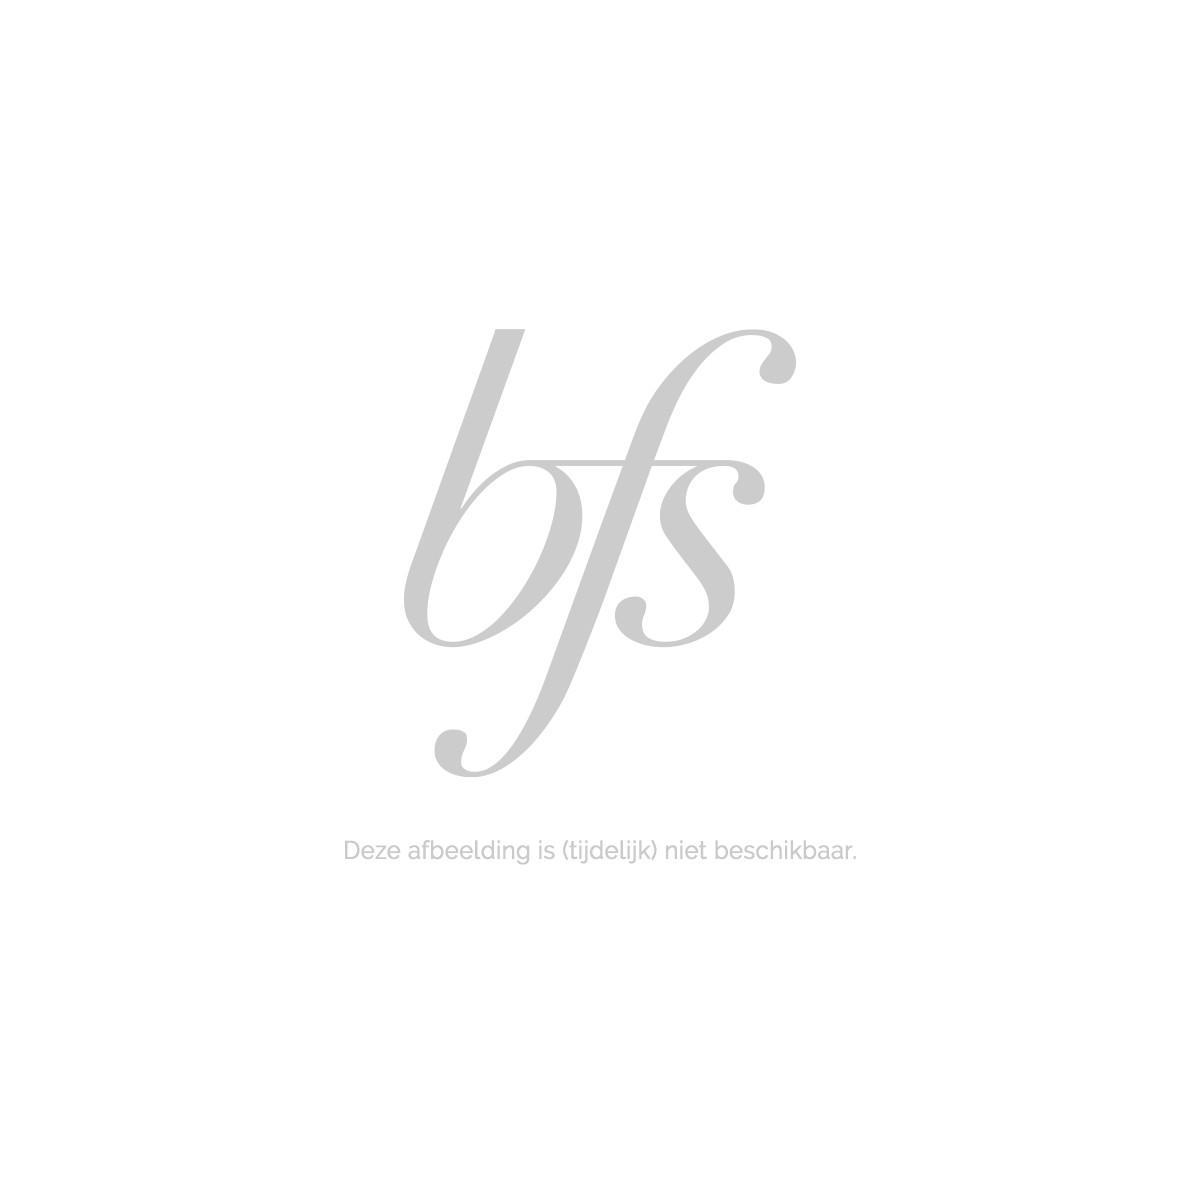 beMineral Brush Flawless Foundation